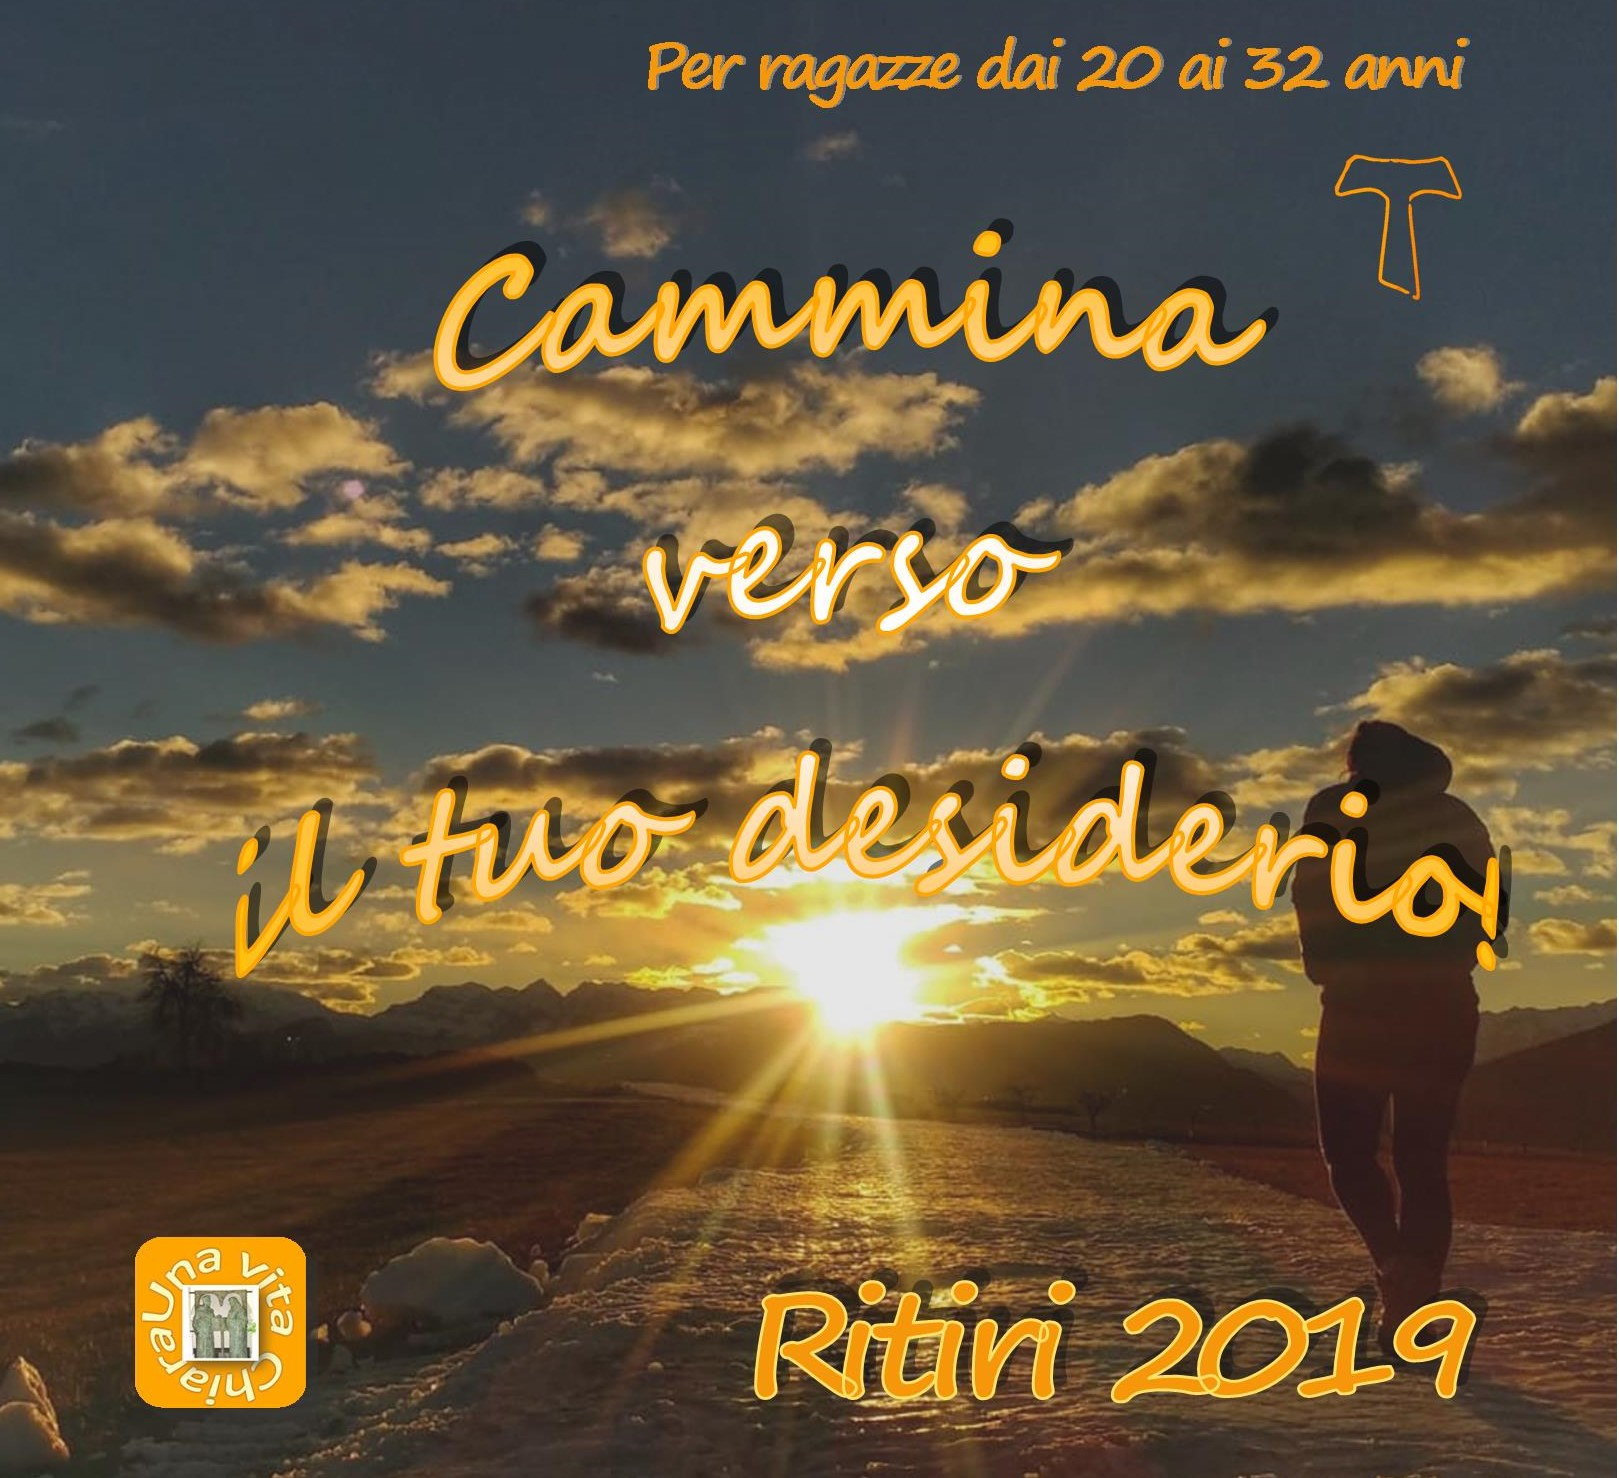 annuale 2019 2